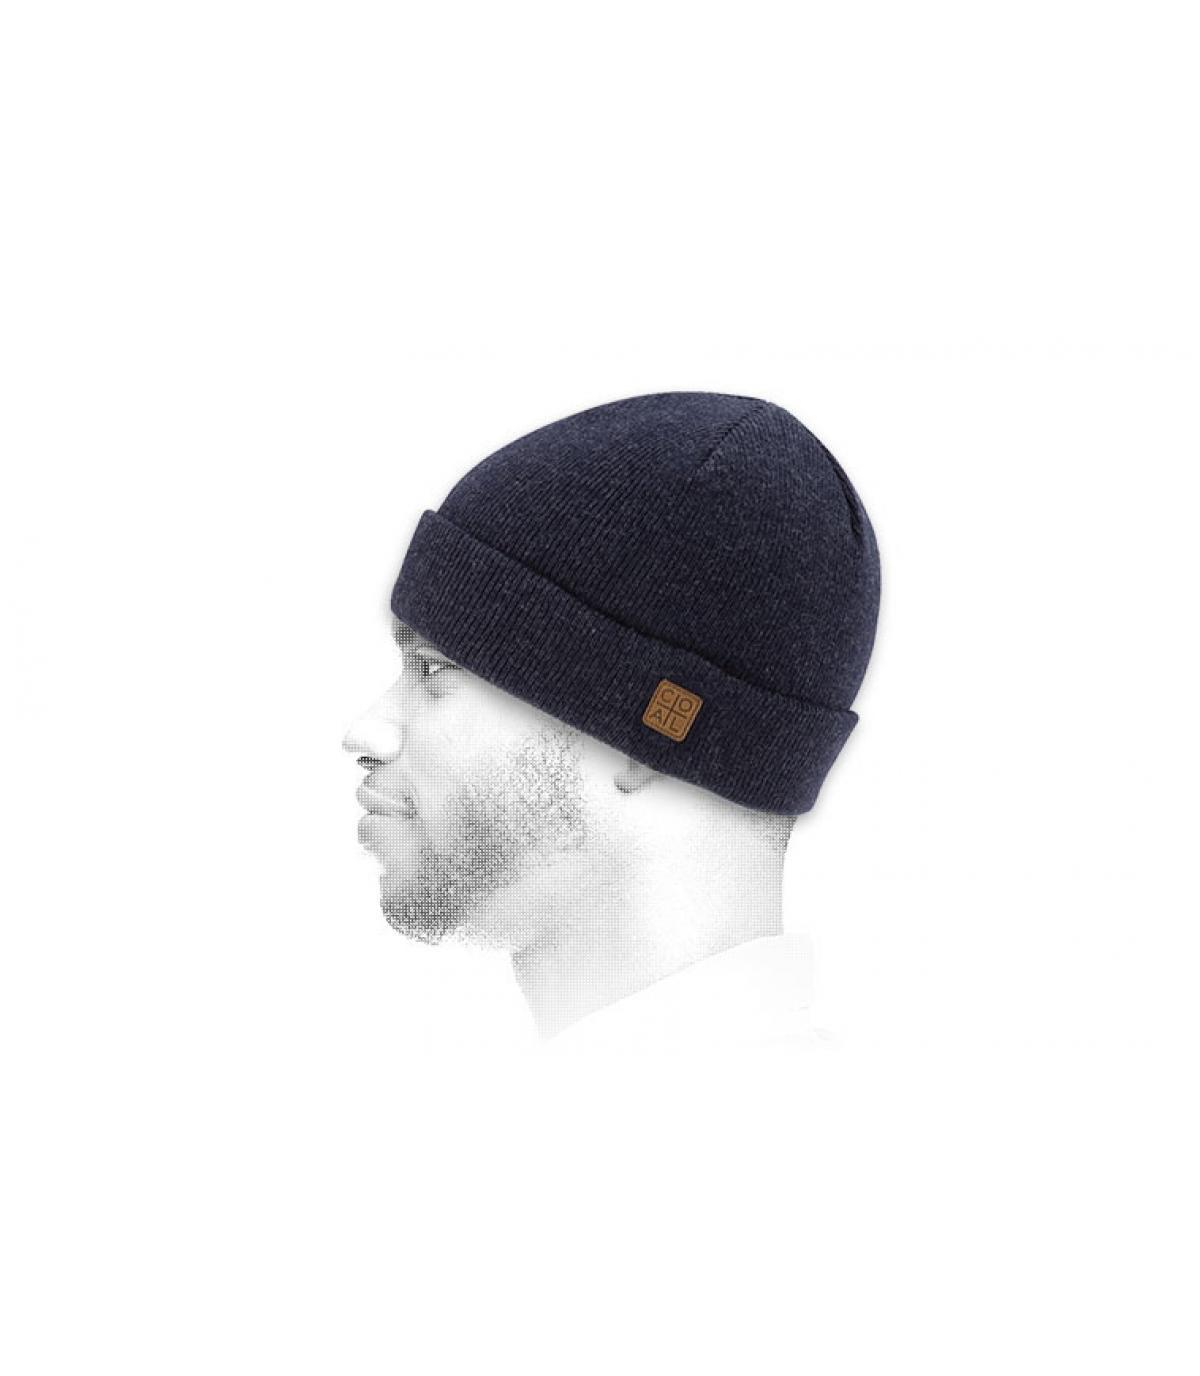 Mütze Rand marieneblau meliert Beanie